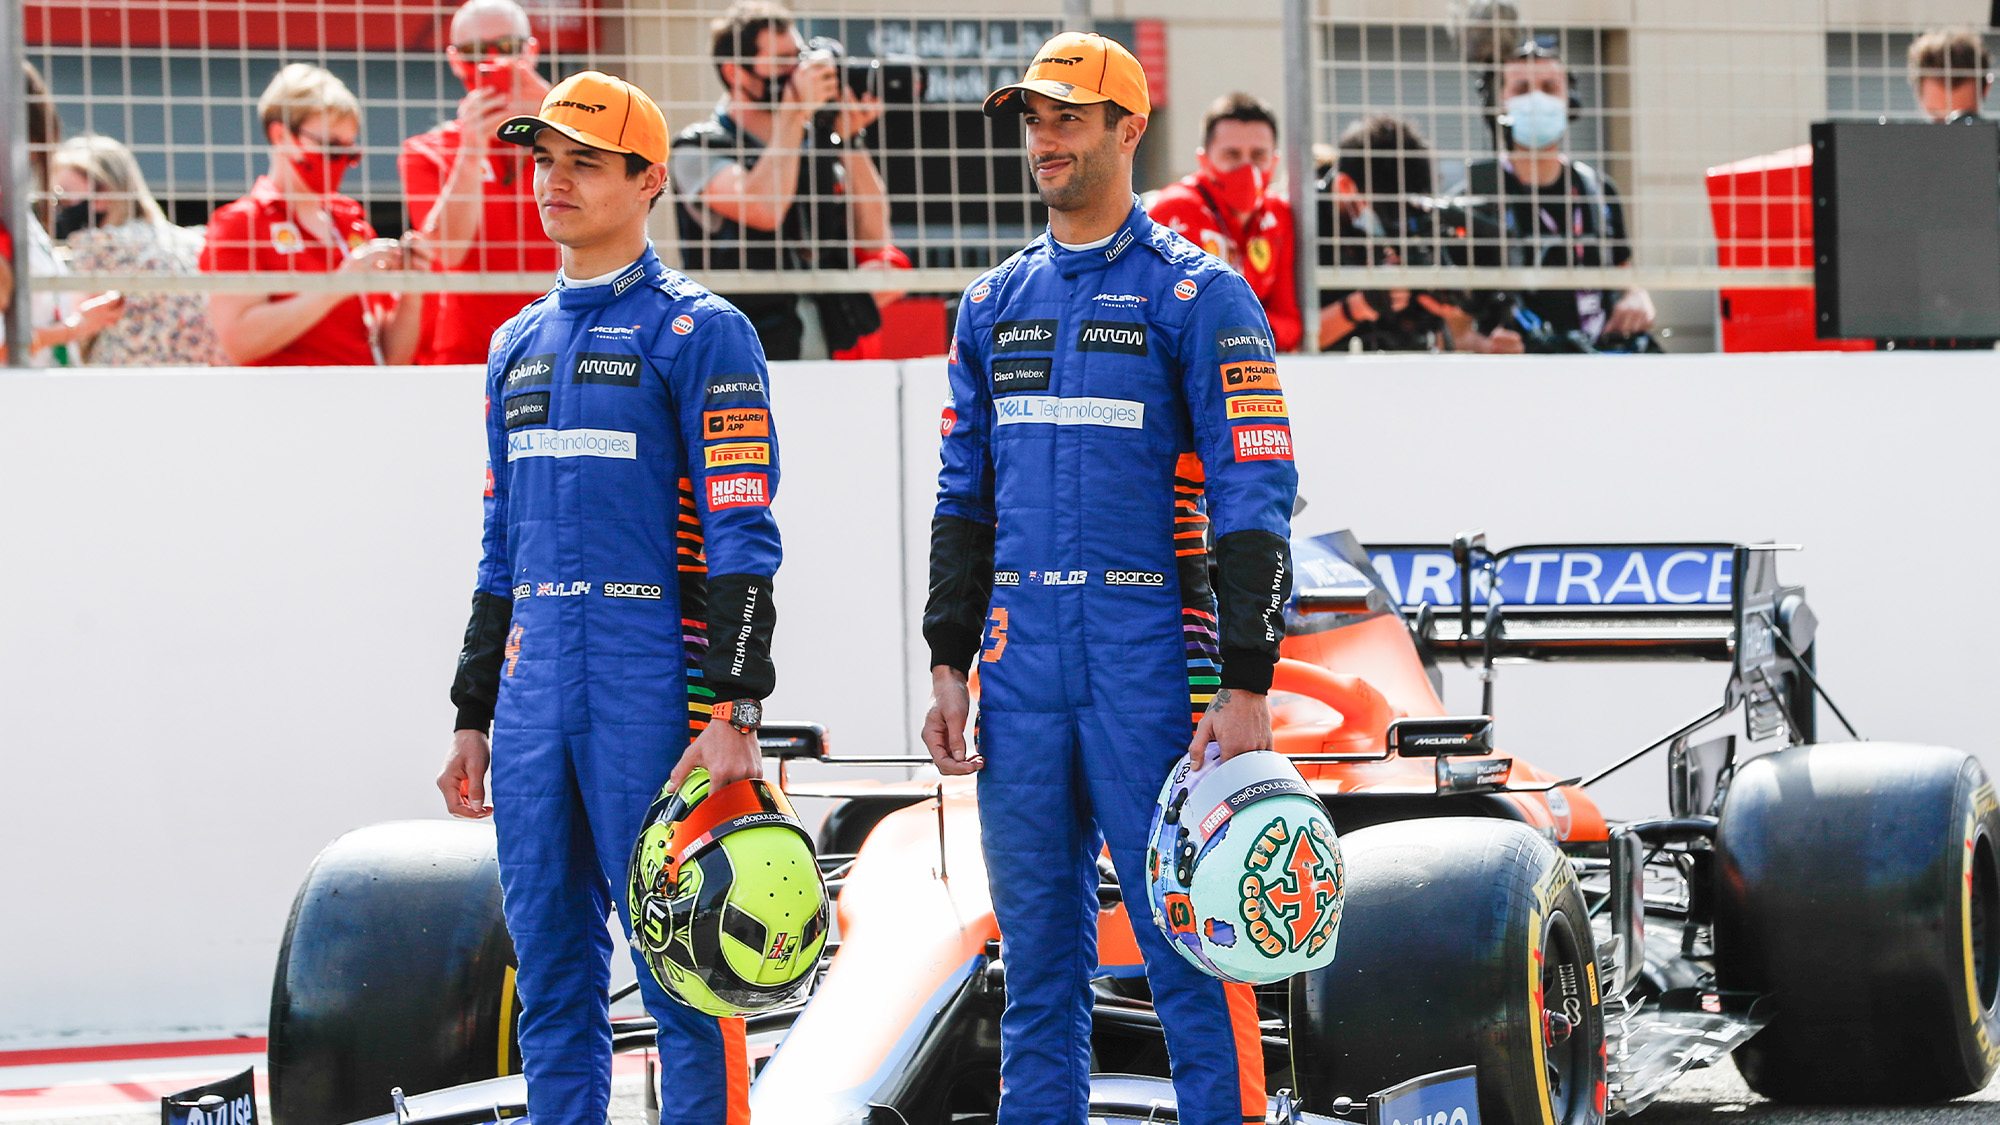 Lando Norris and Daniel ricciardo ahead of the 2021 F1 season